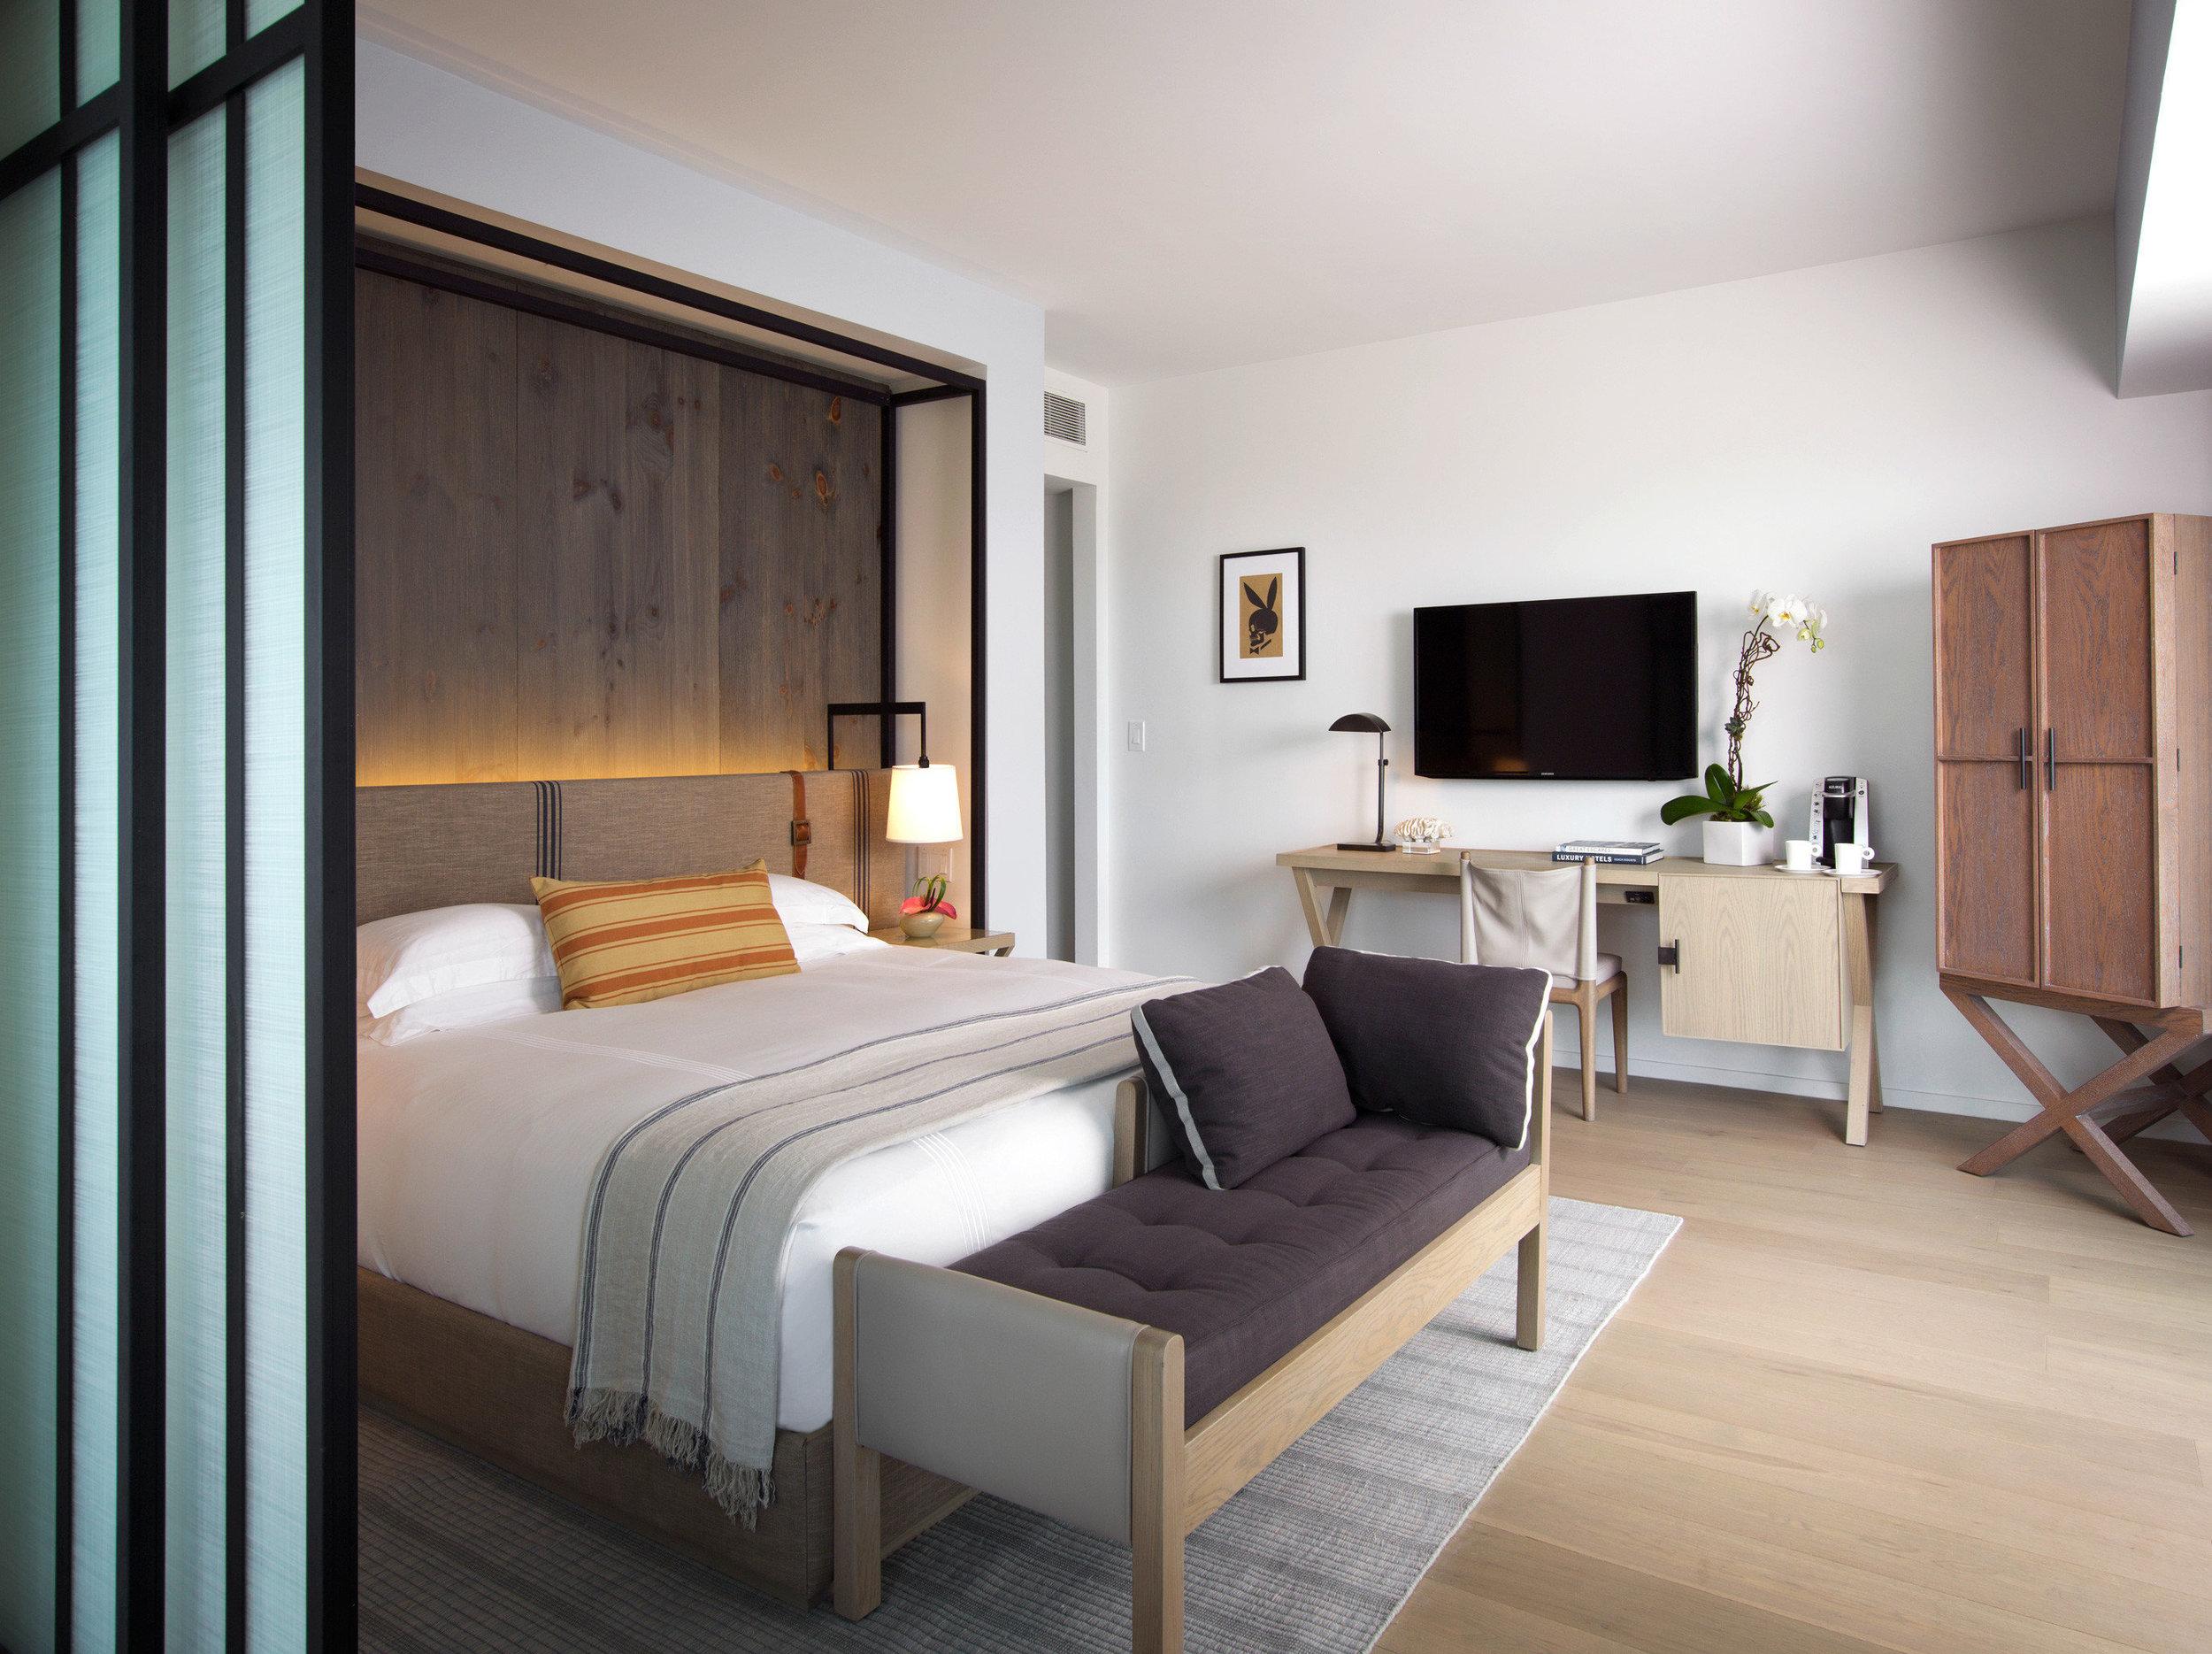 balcony-bedroom-luxury-scenic-views-2.jpeg